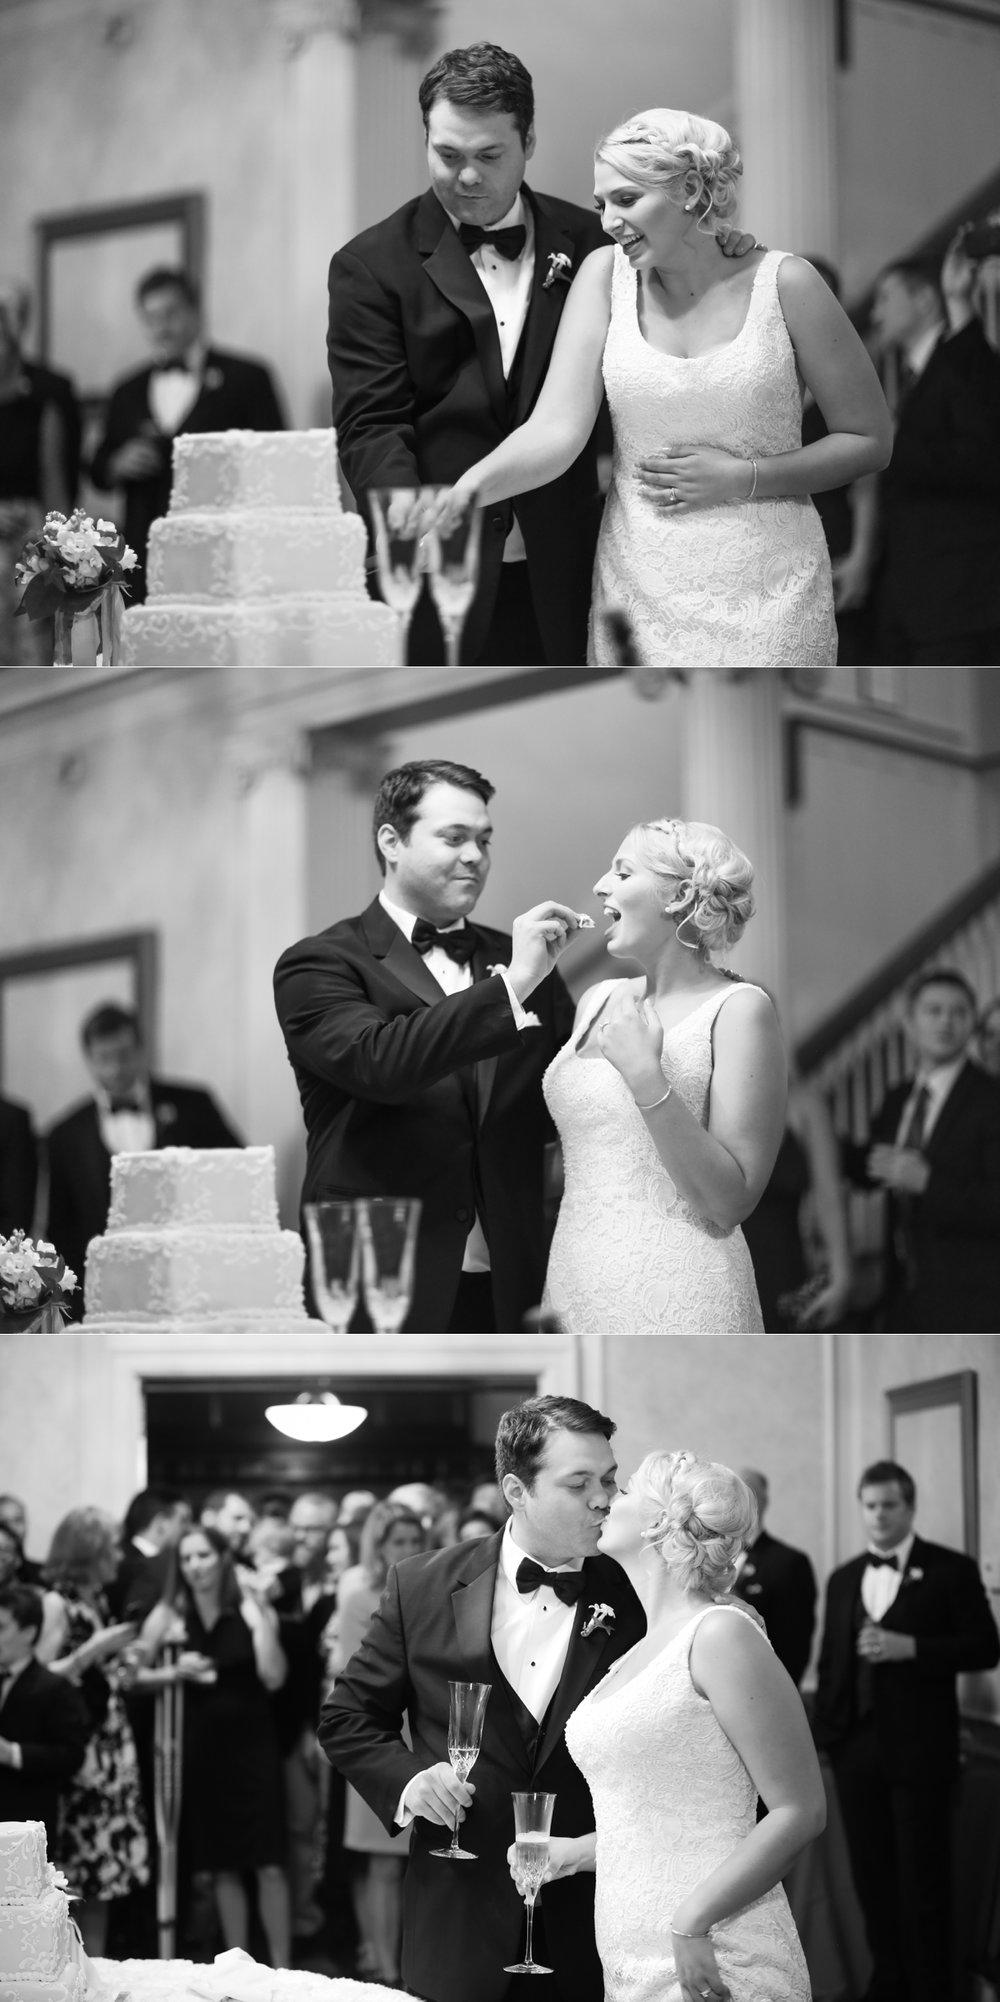 audreysnow-photography-kansas-city-wedding-photographer-longview-mansion_4065.jpg